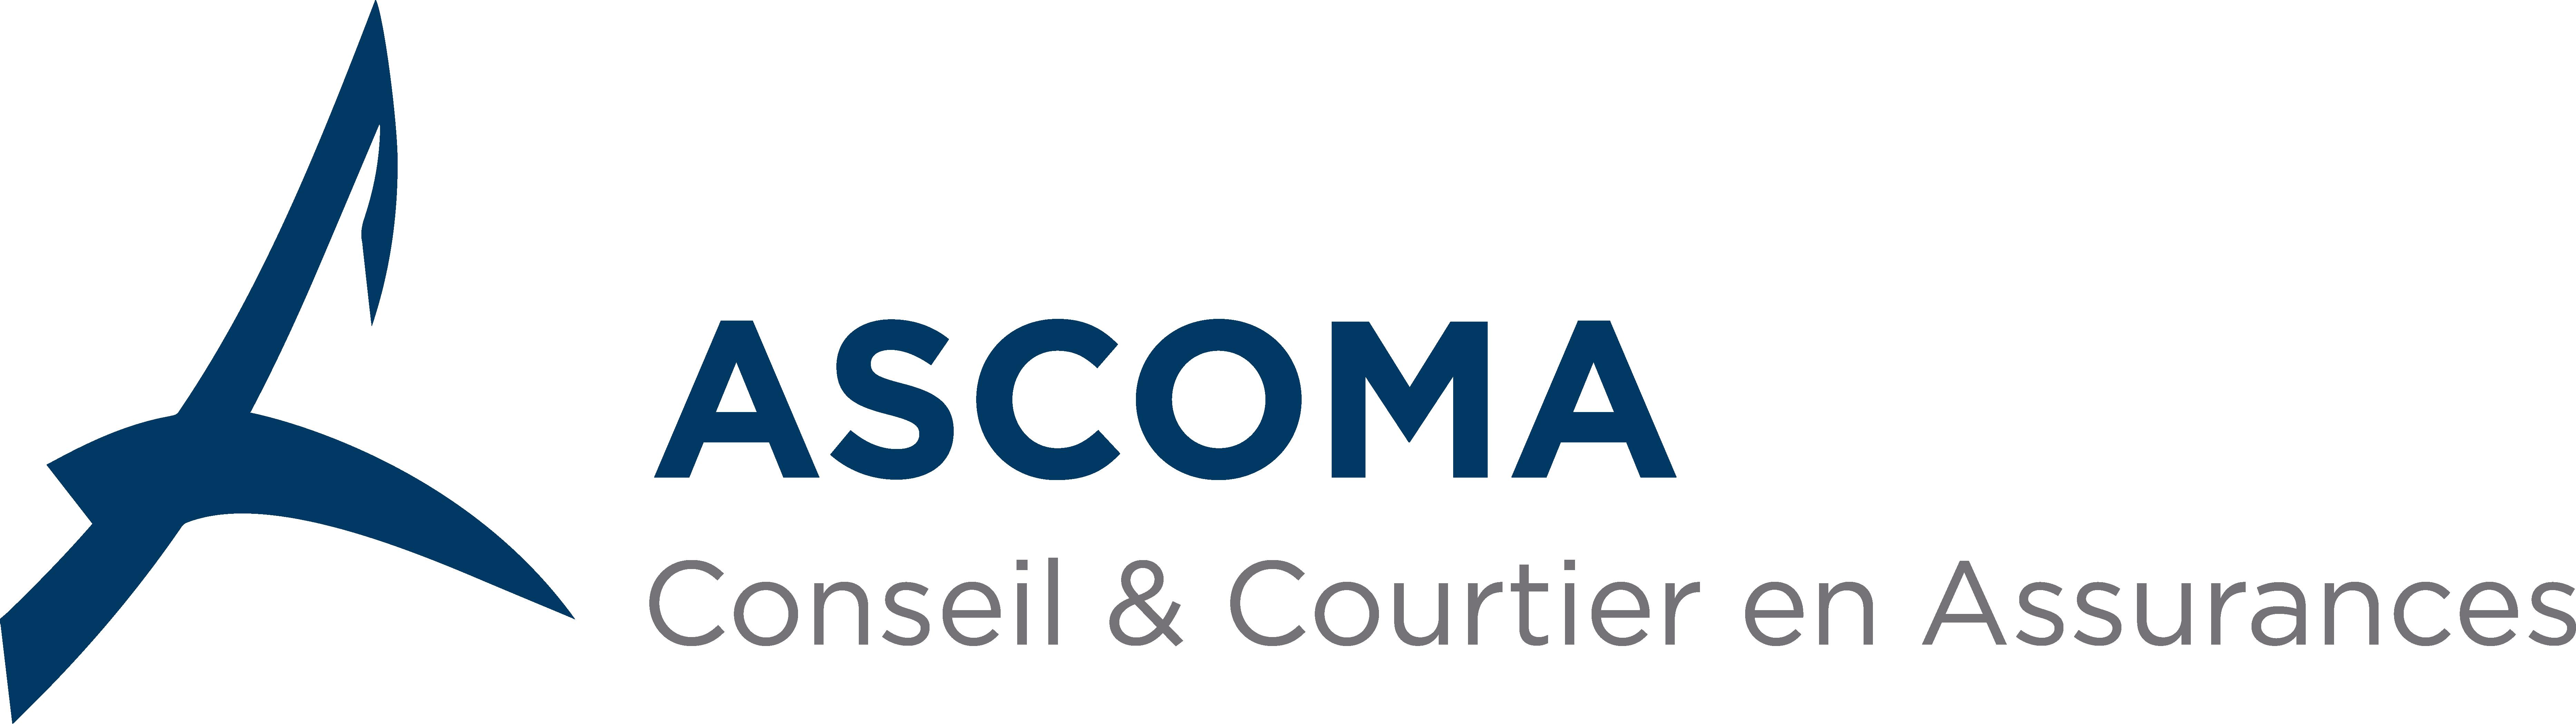 ASCOMA ASSUREURS CONSEILS